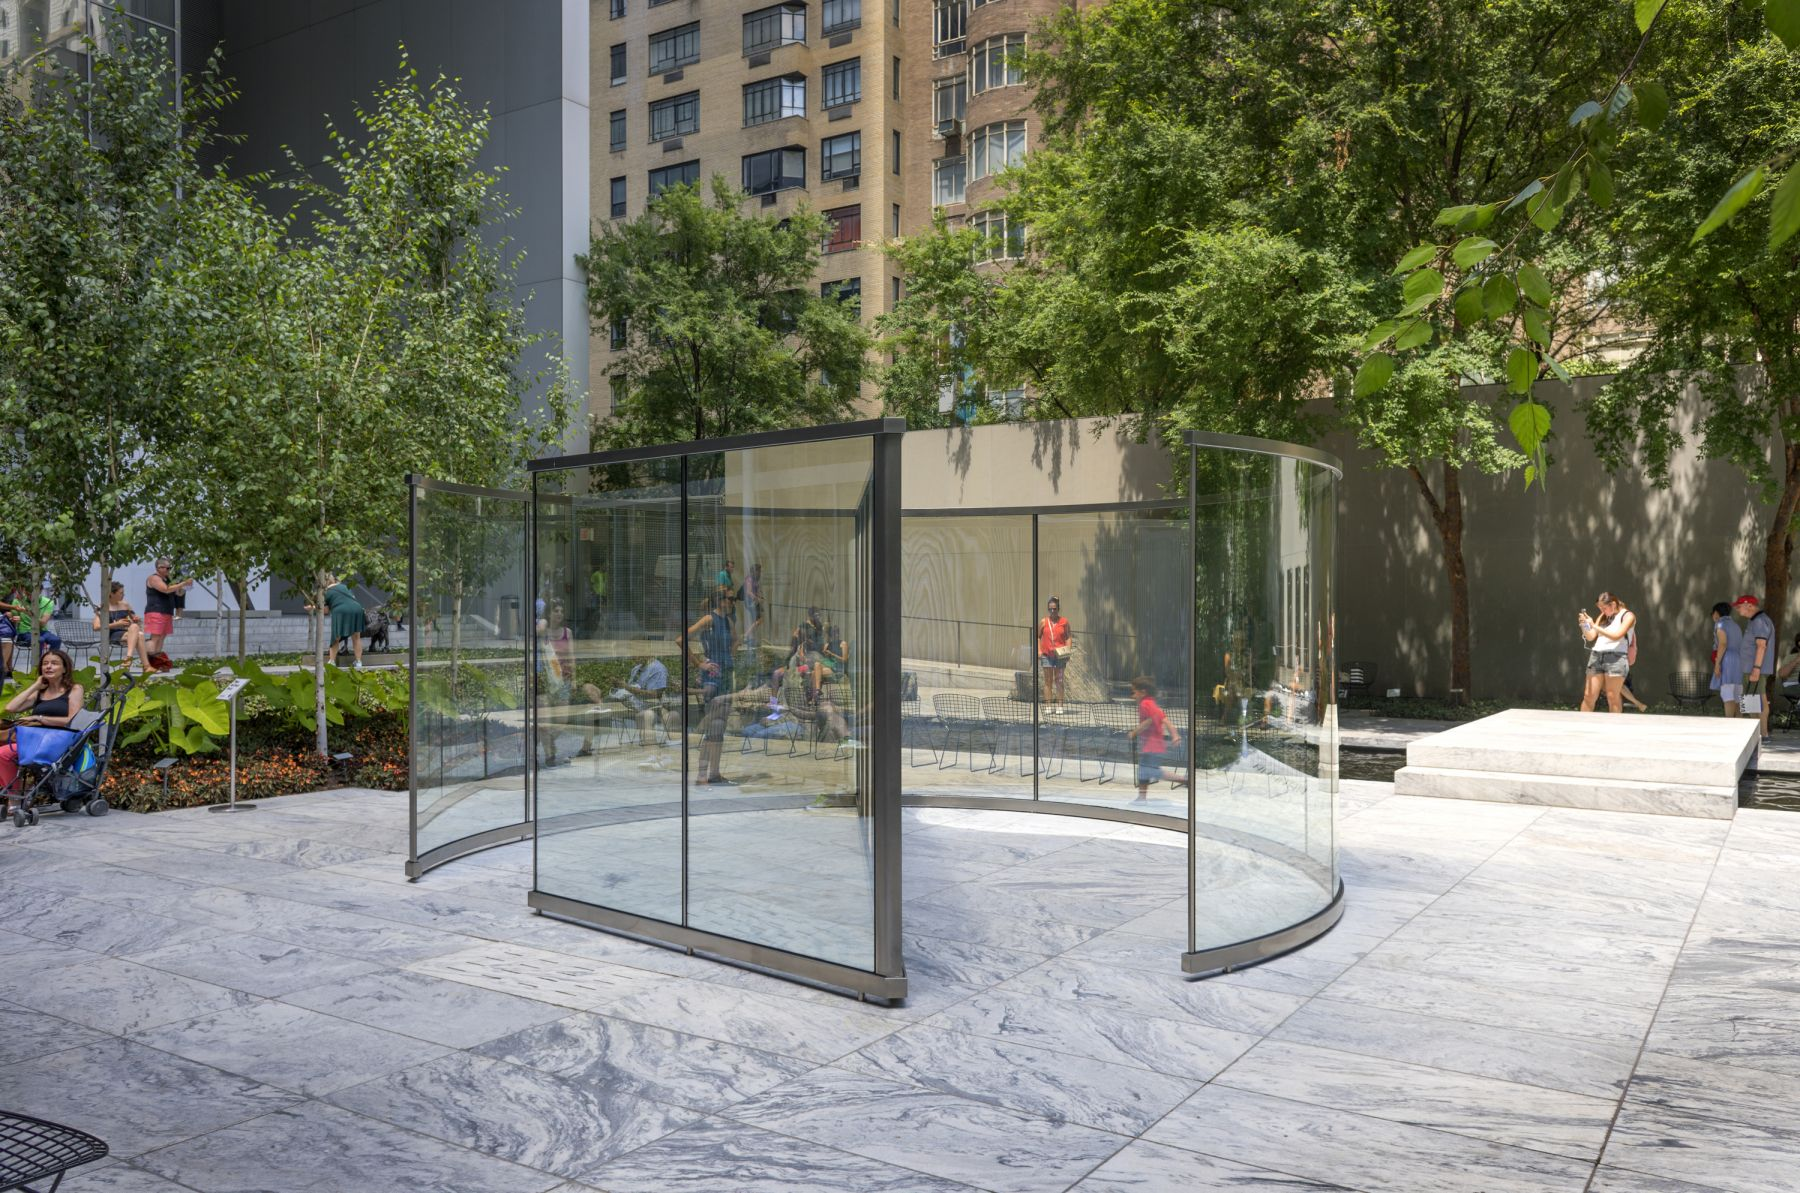 Dan Graham,Child's Play,2016, Installation view, The Museum of Modern Art, 2017